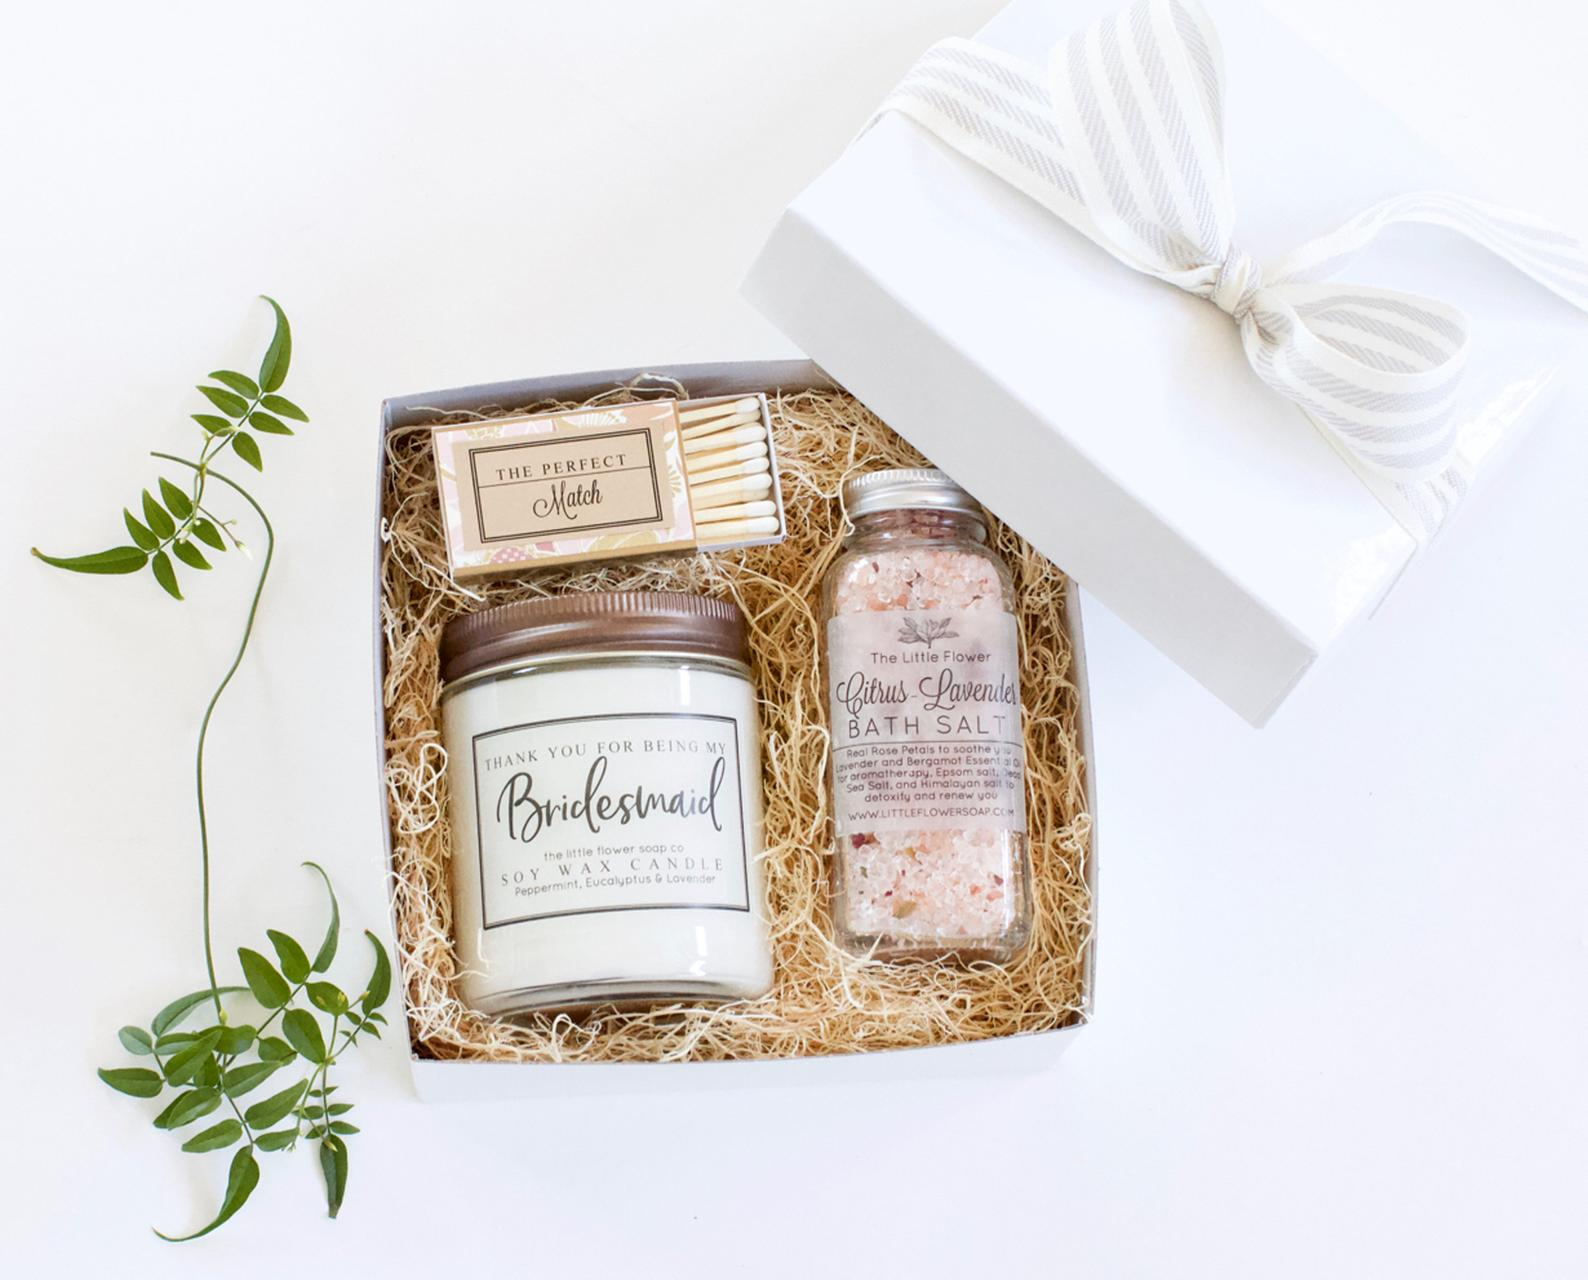 bath salt candle personalized bridesmaid proposal gifts wedding presents